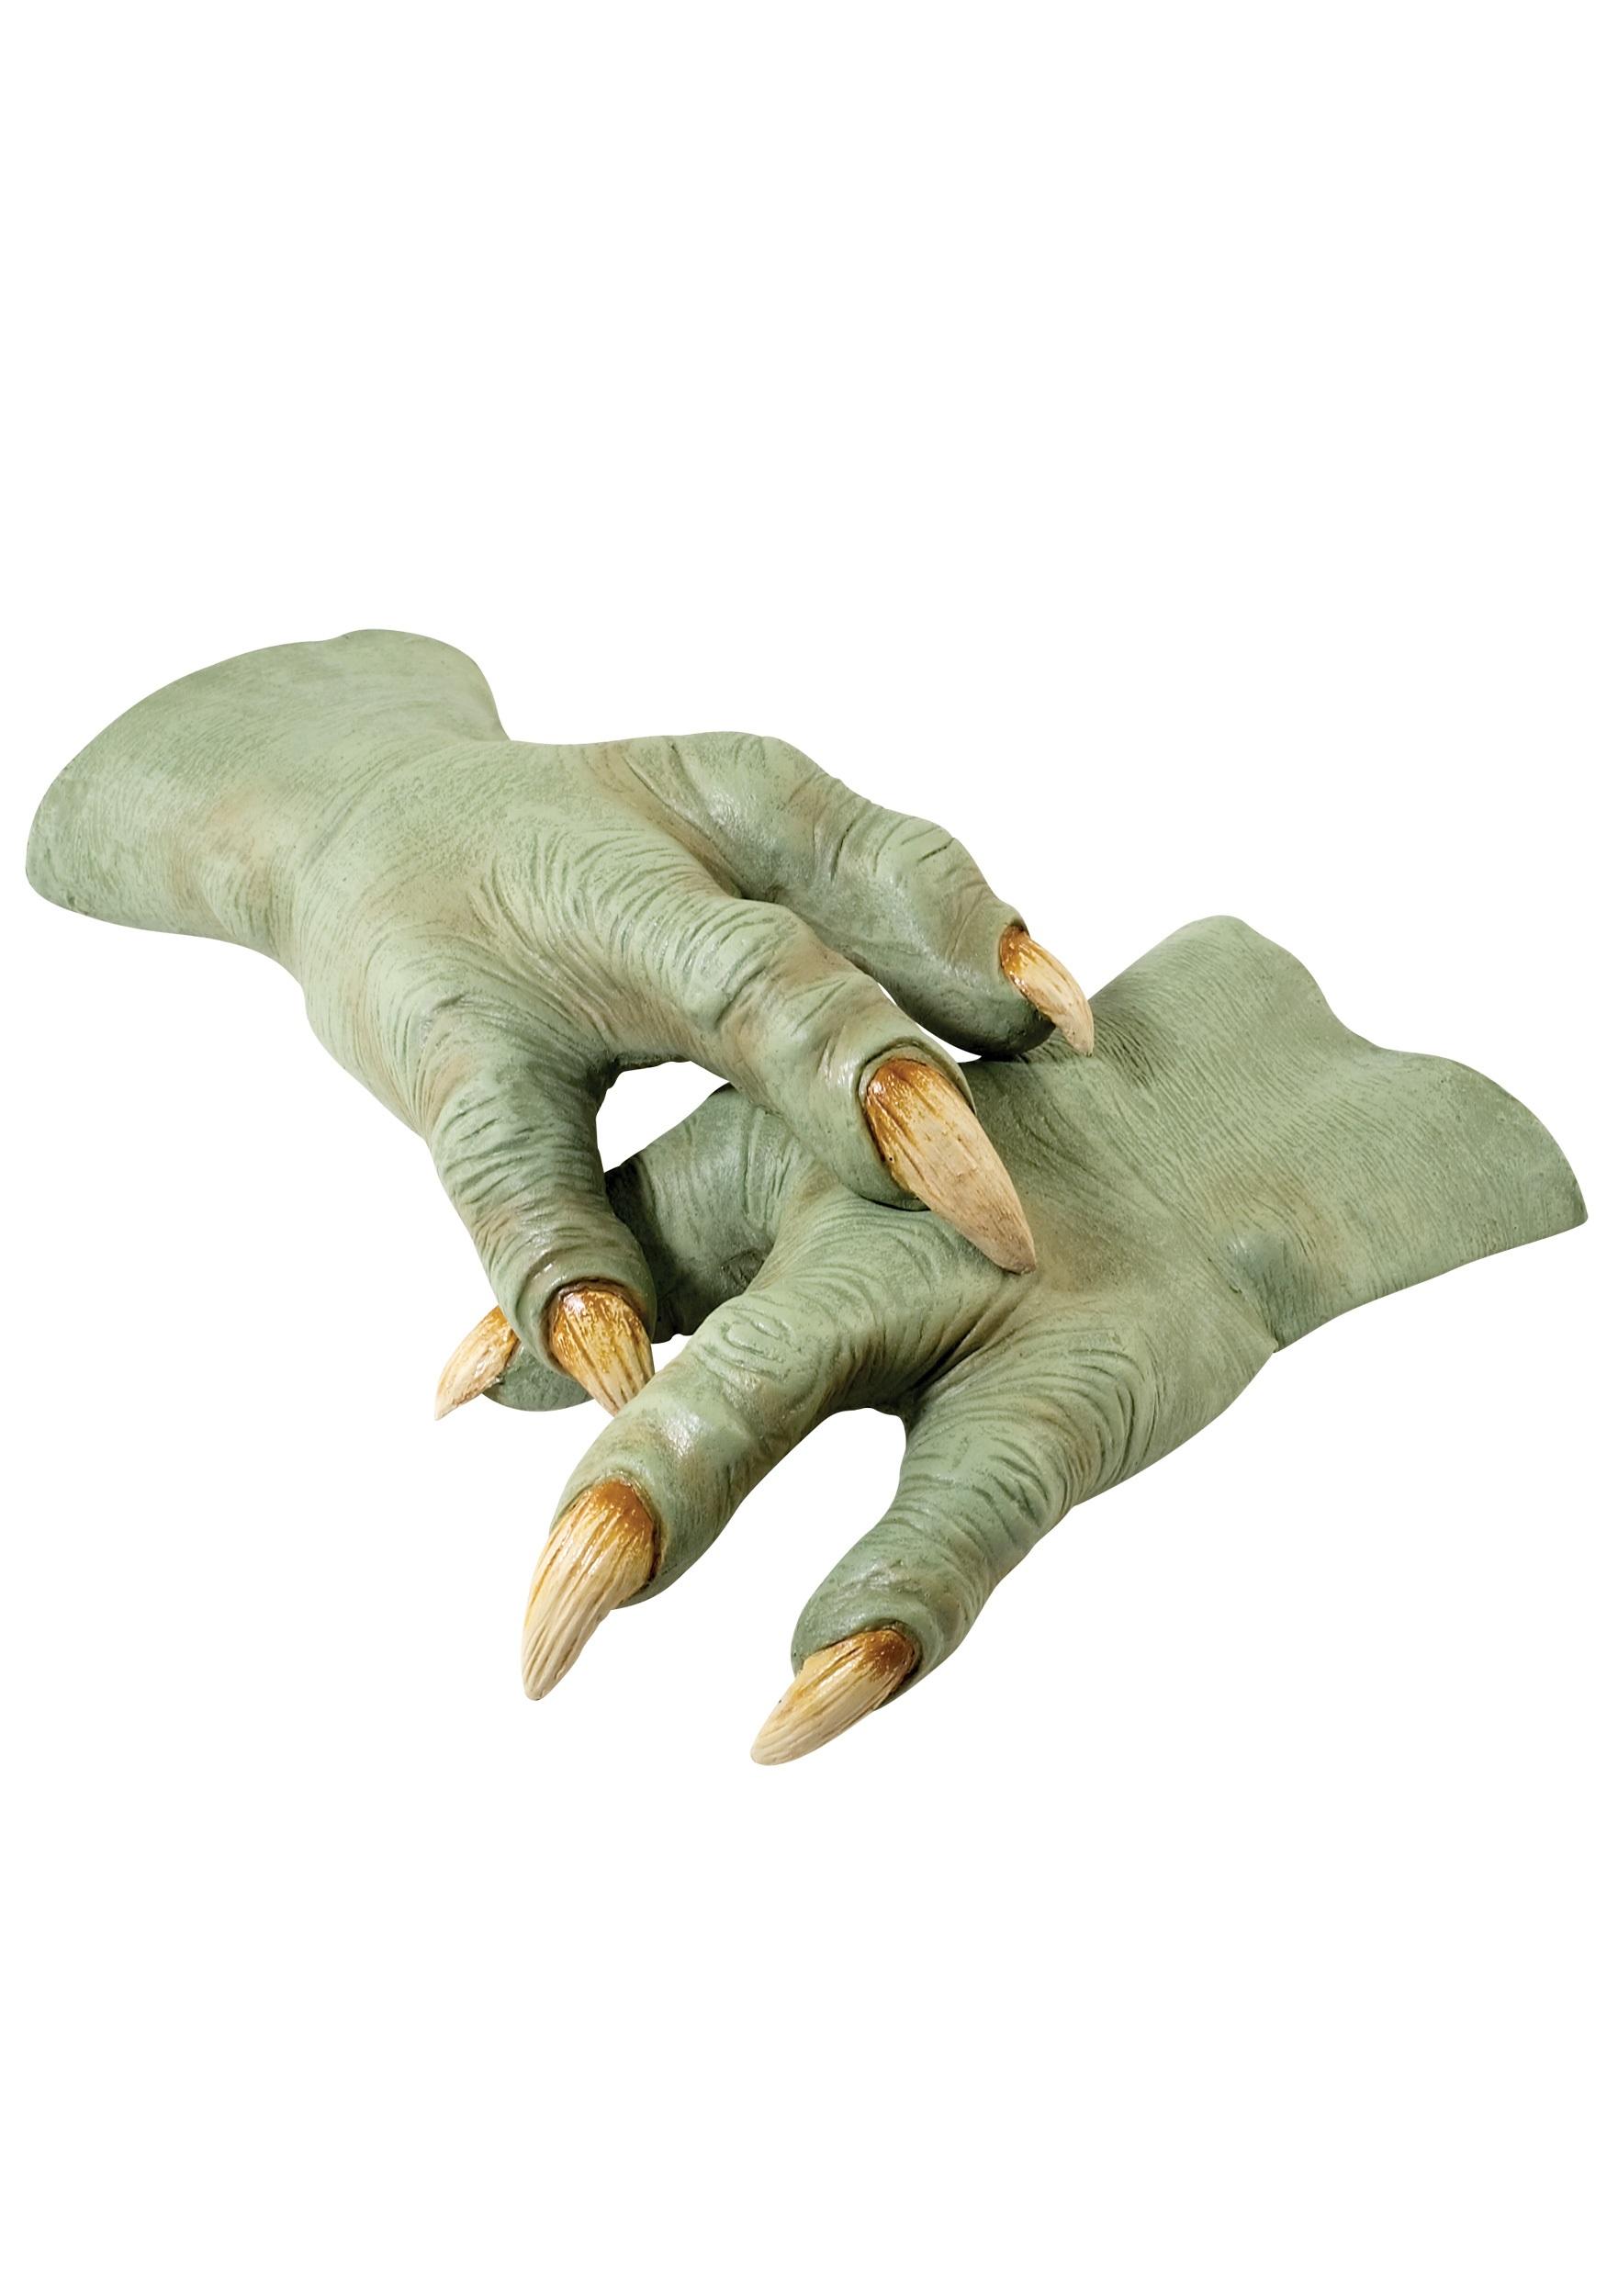 Yoda Hands Official Star Wars